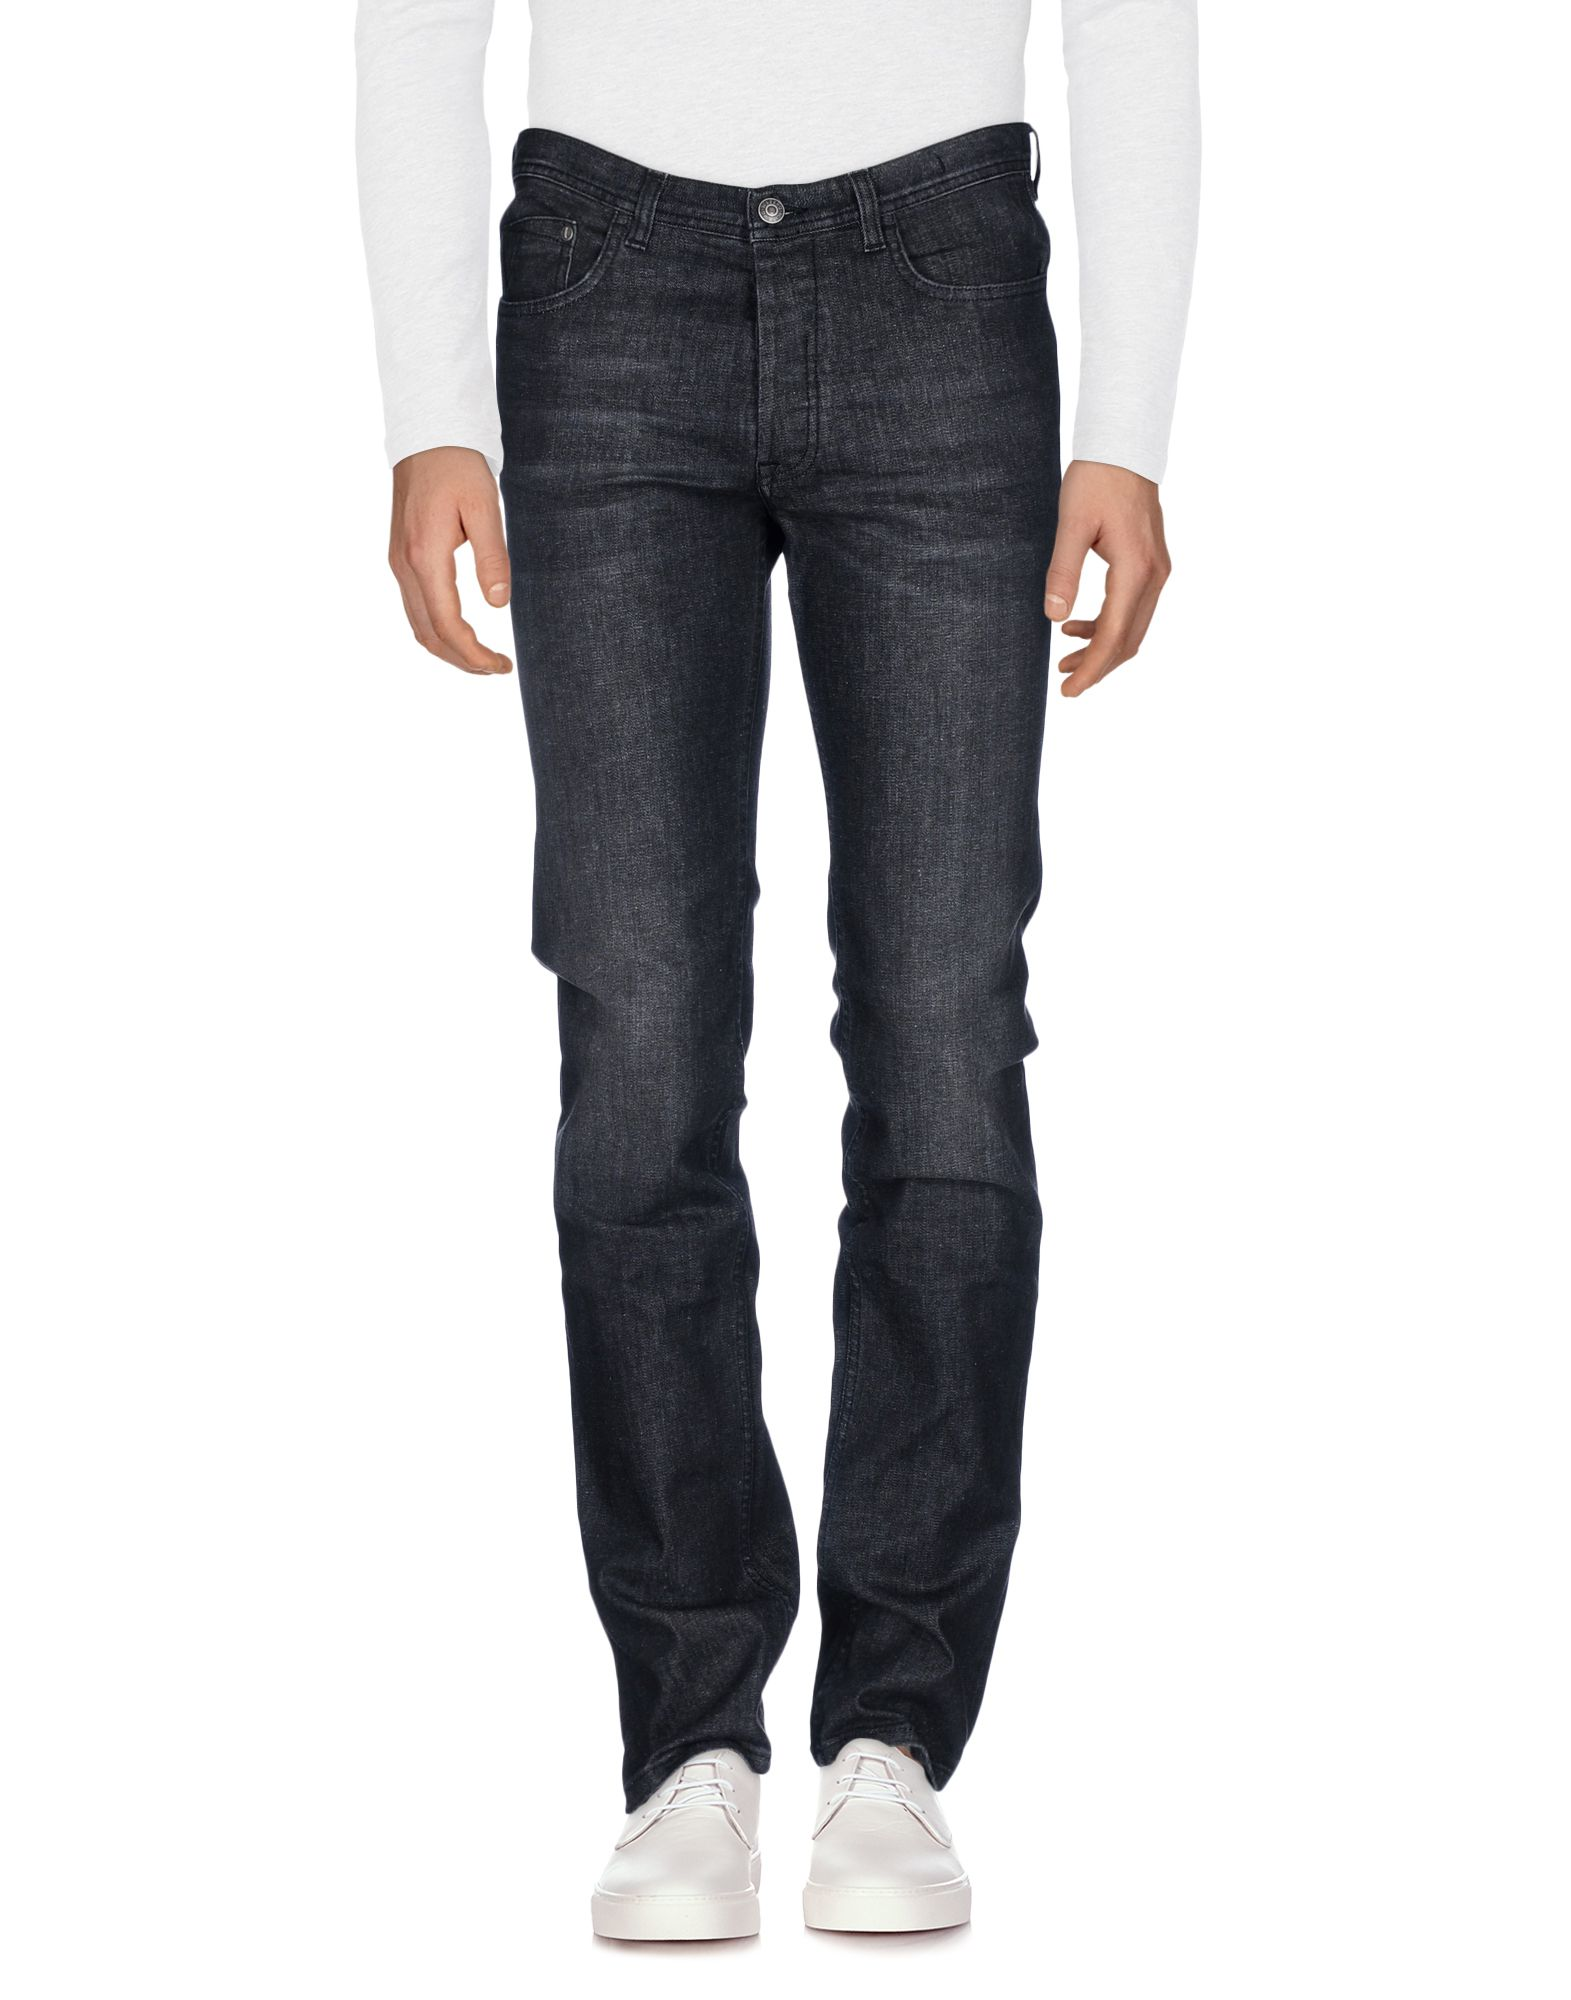 ICEBERG Herren Jeanshose Farbe Schwarz Größe 6